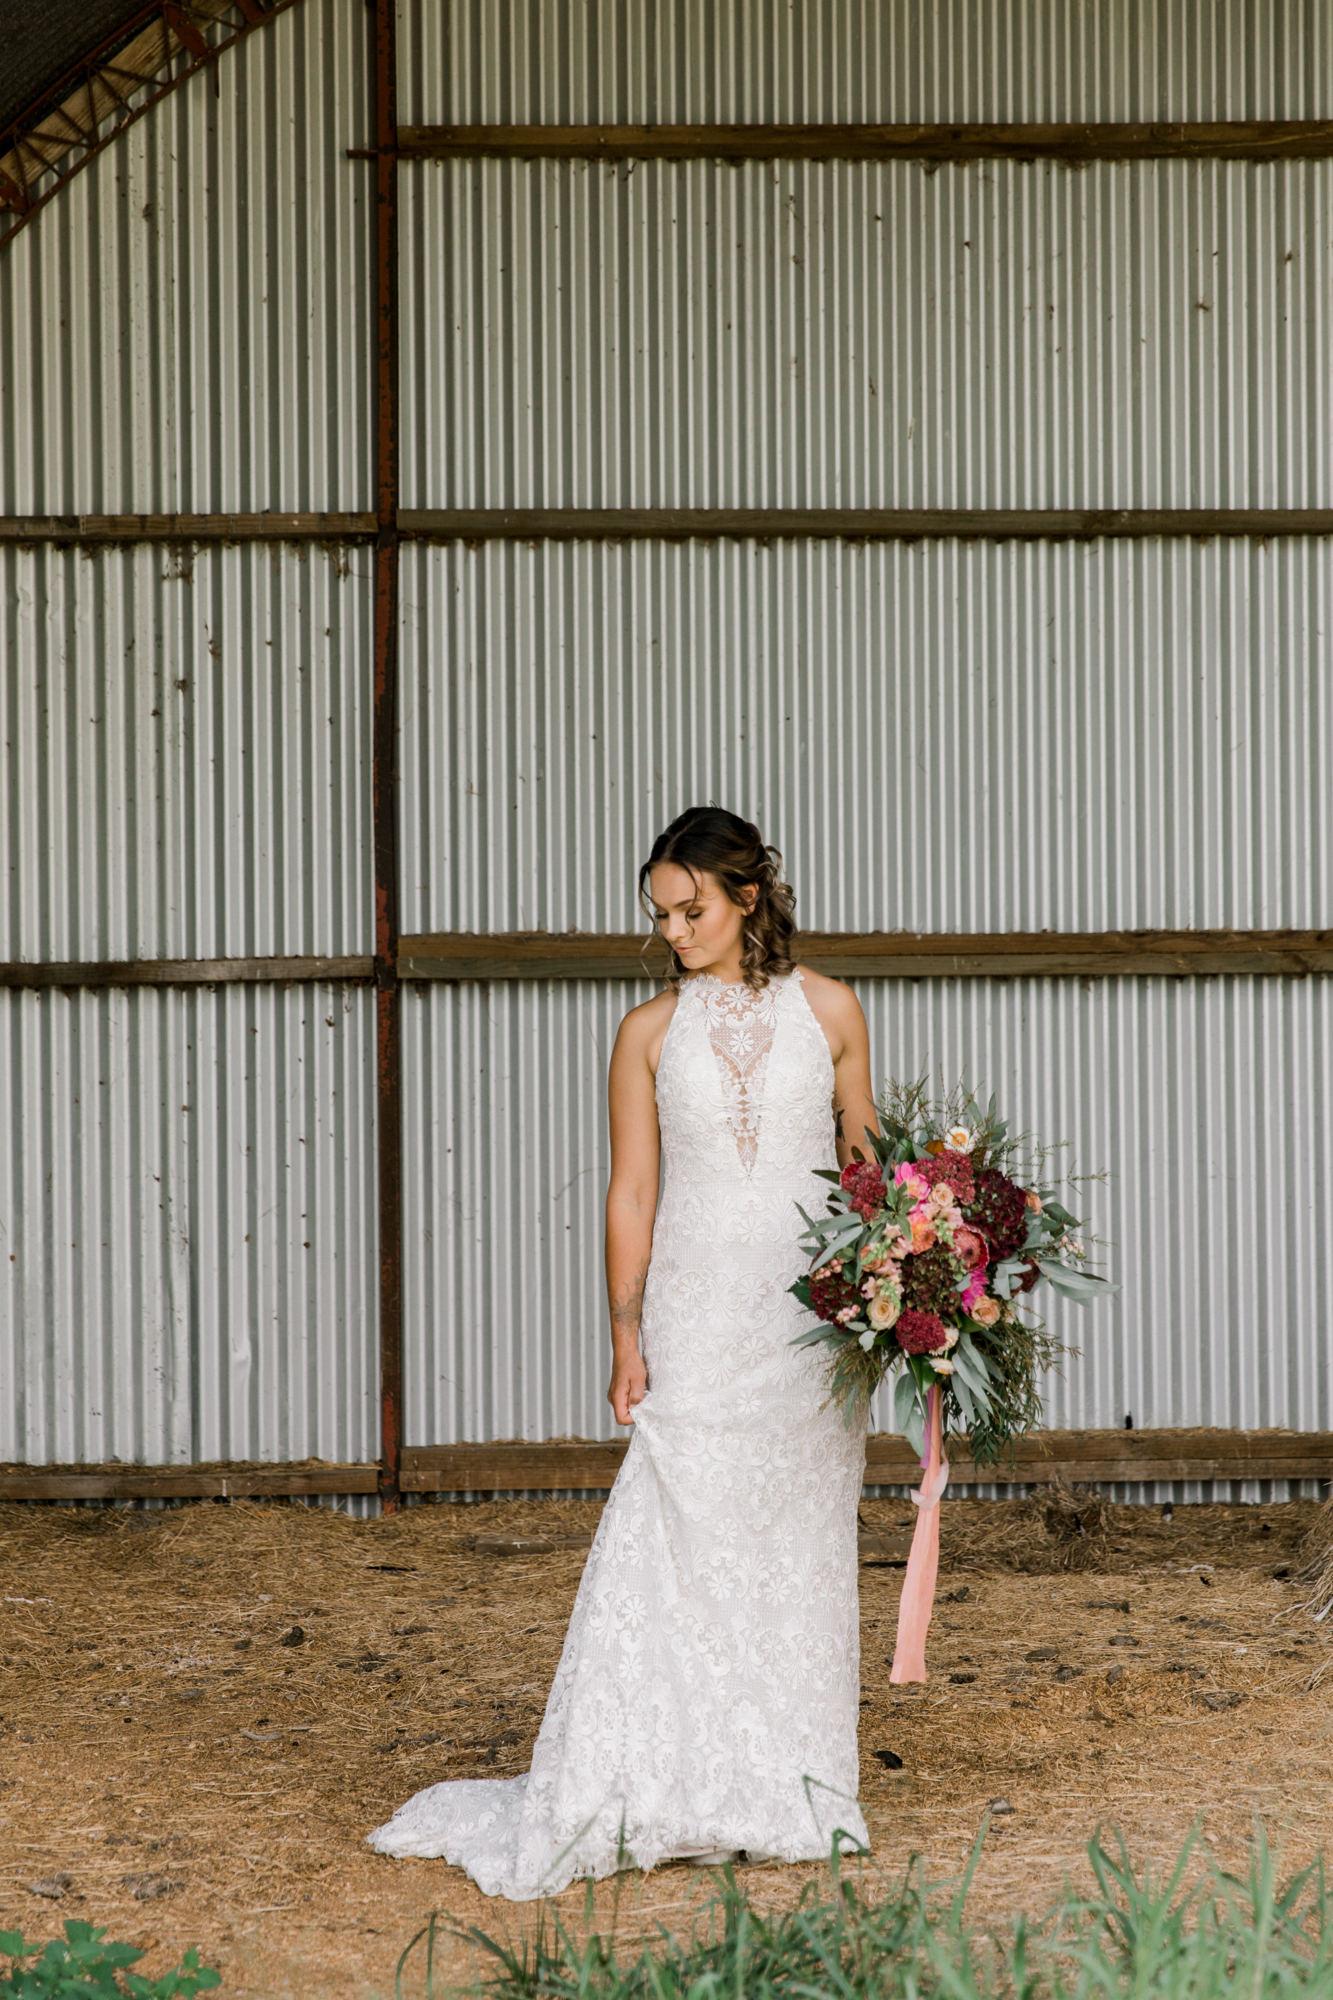 matamata country blush styled shoot © Sweet Events Photography 2018-0980.jpg